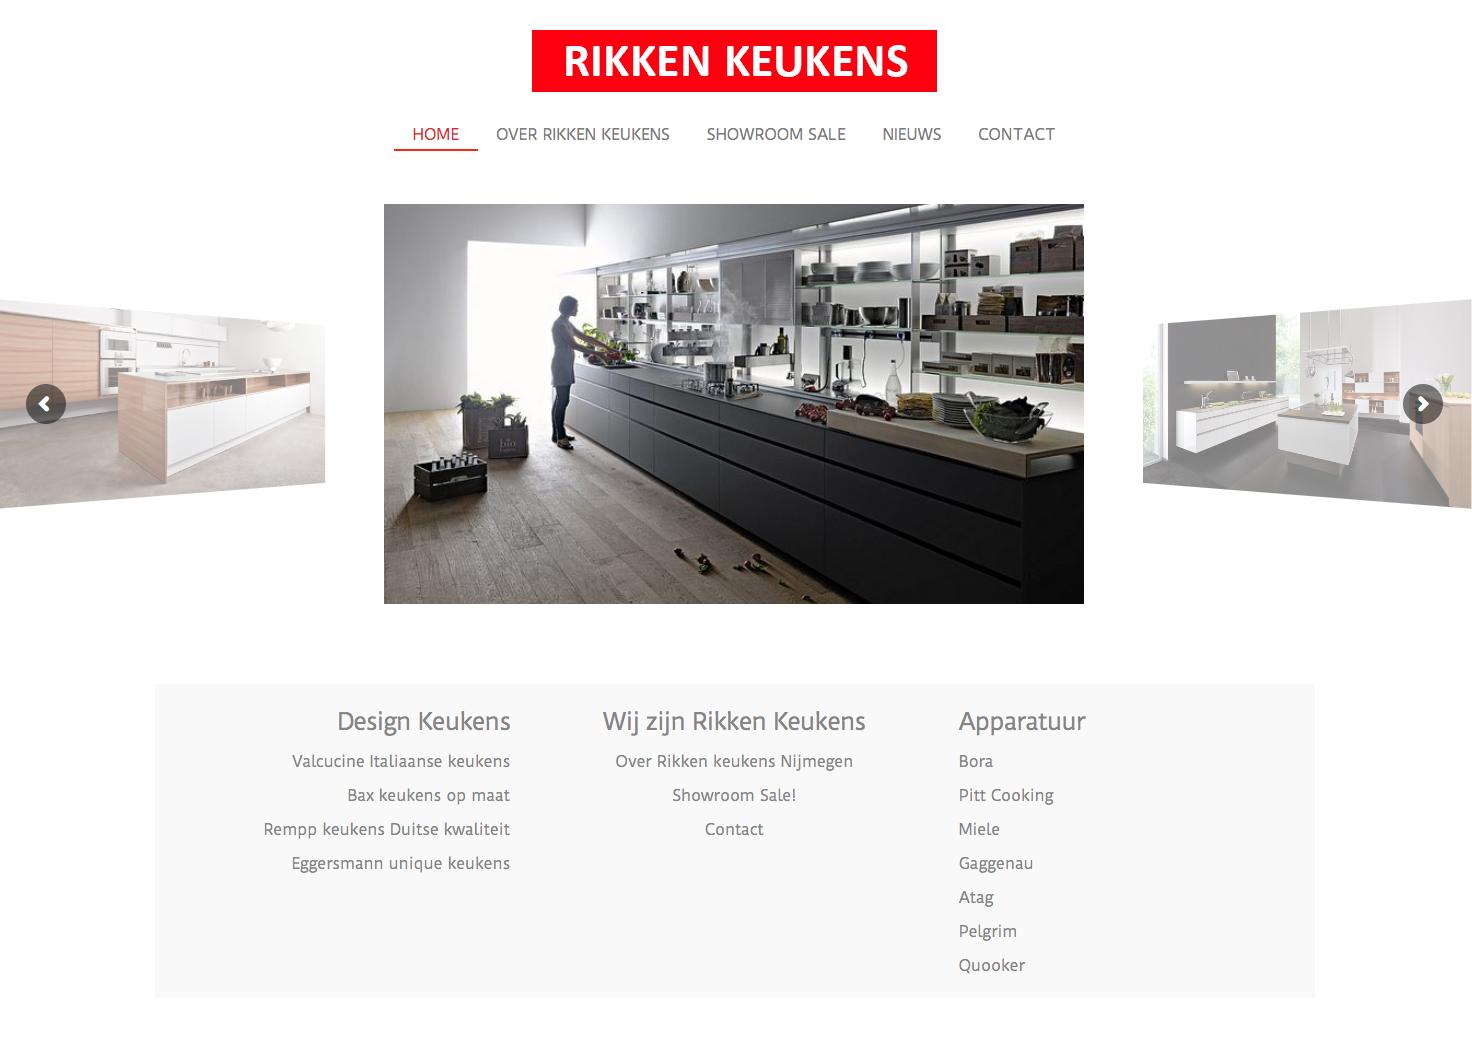 Rikken Keukens Nijmegen Quest